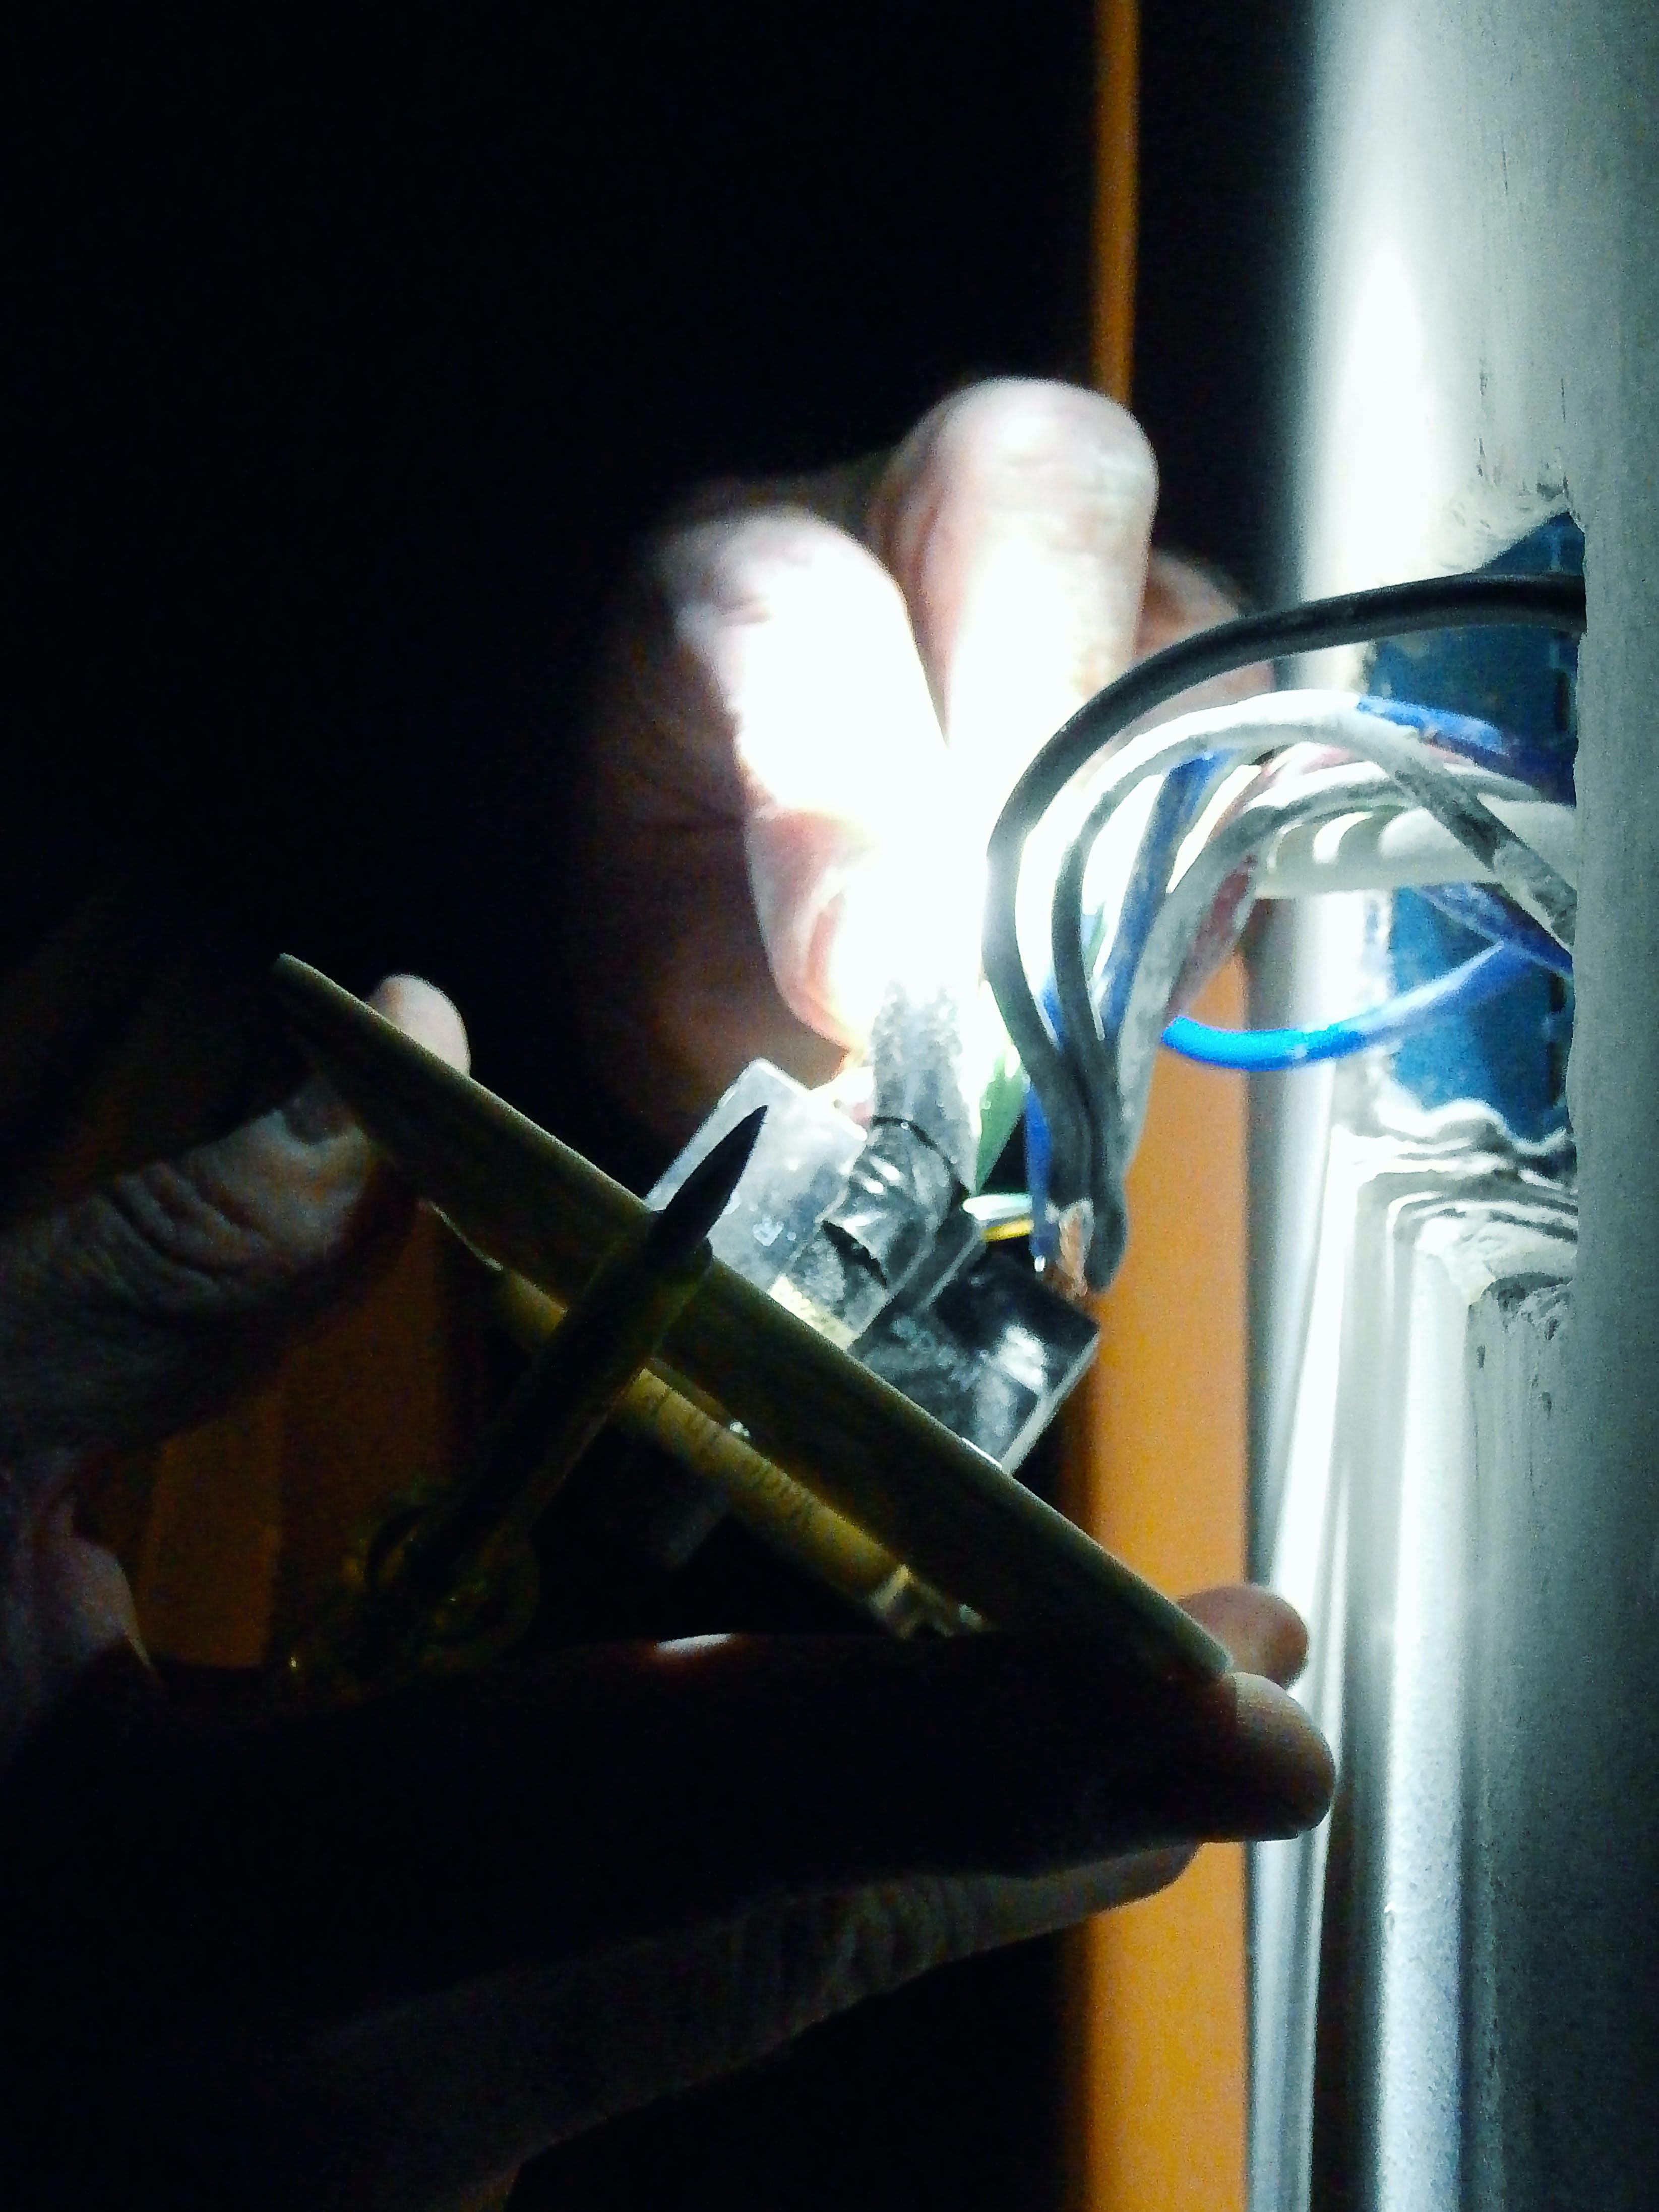 Free stock photo of dark, electrician, electricity, flashlight